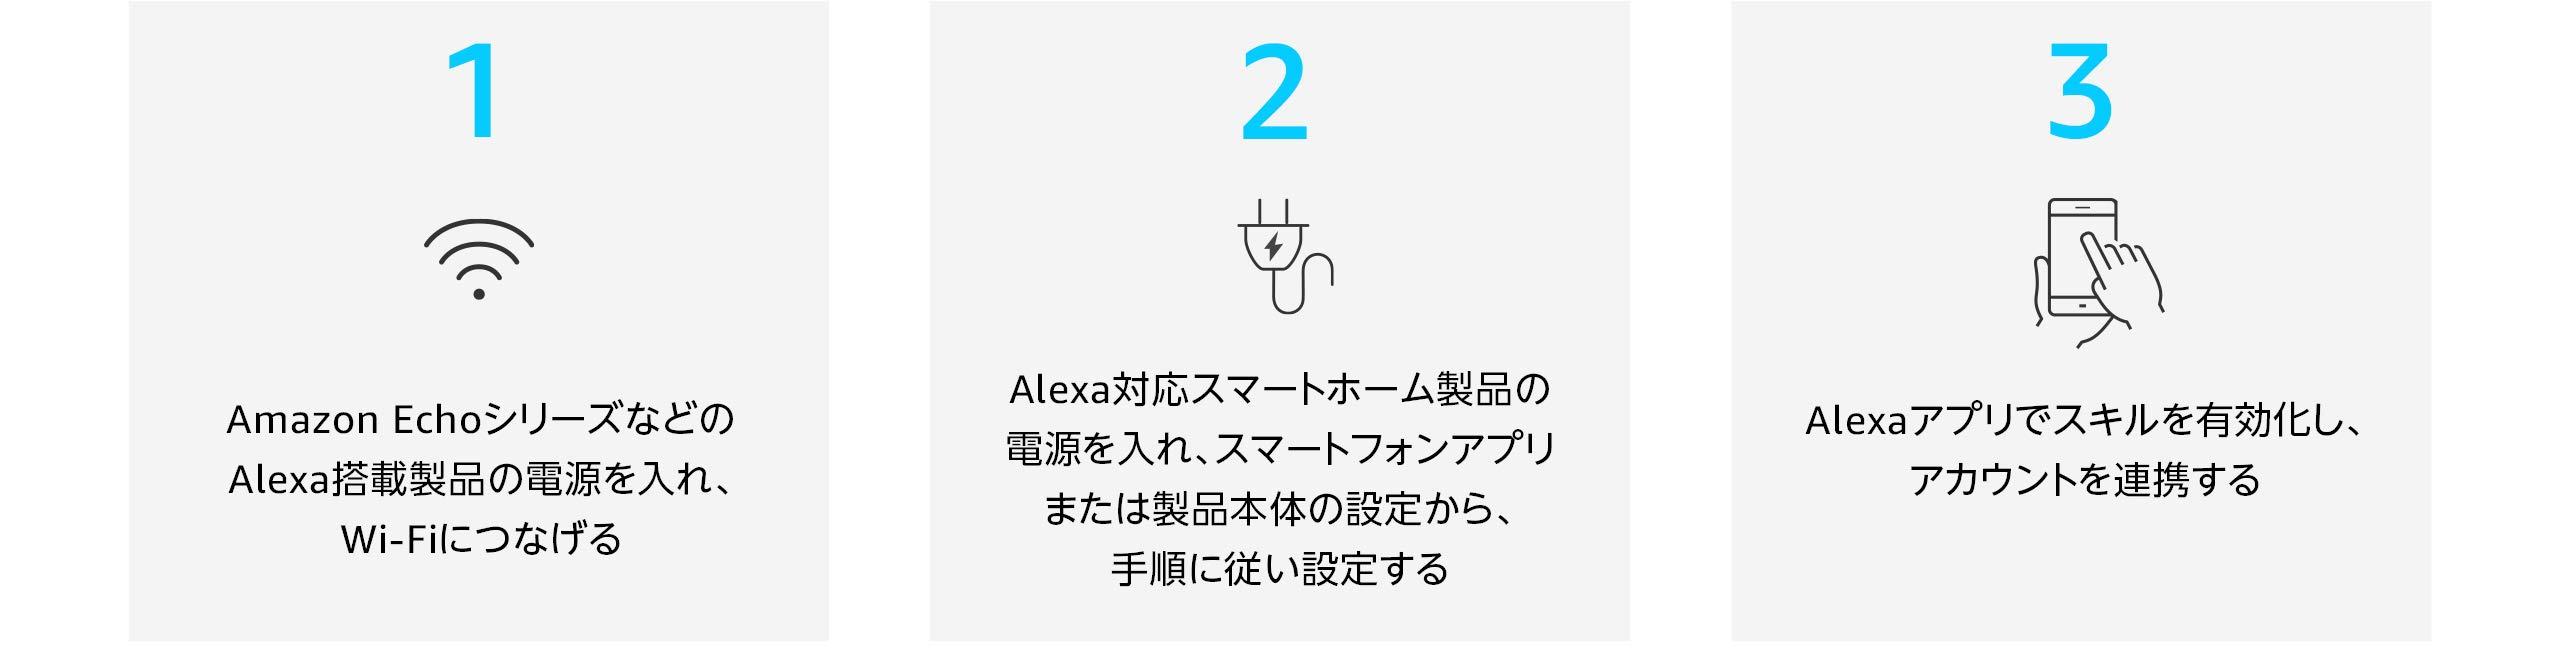 Alexa スマートホーム